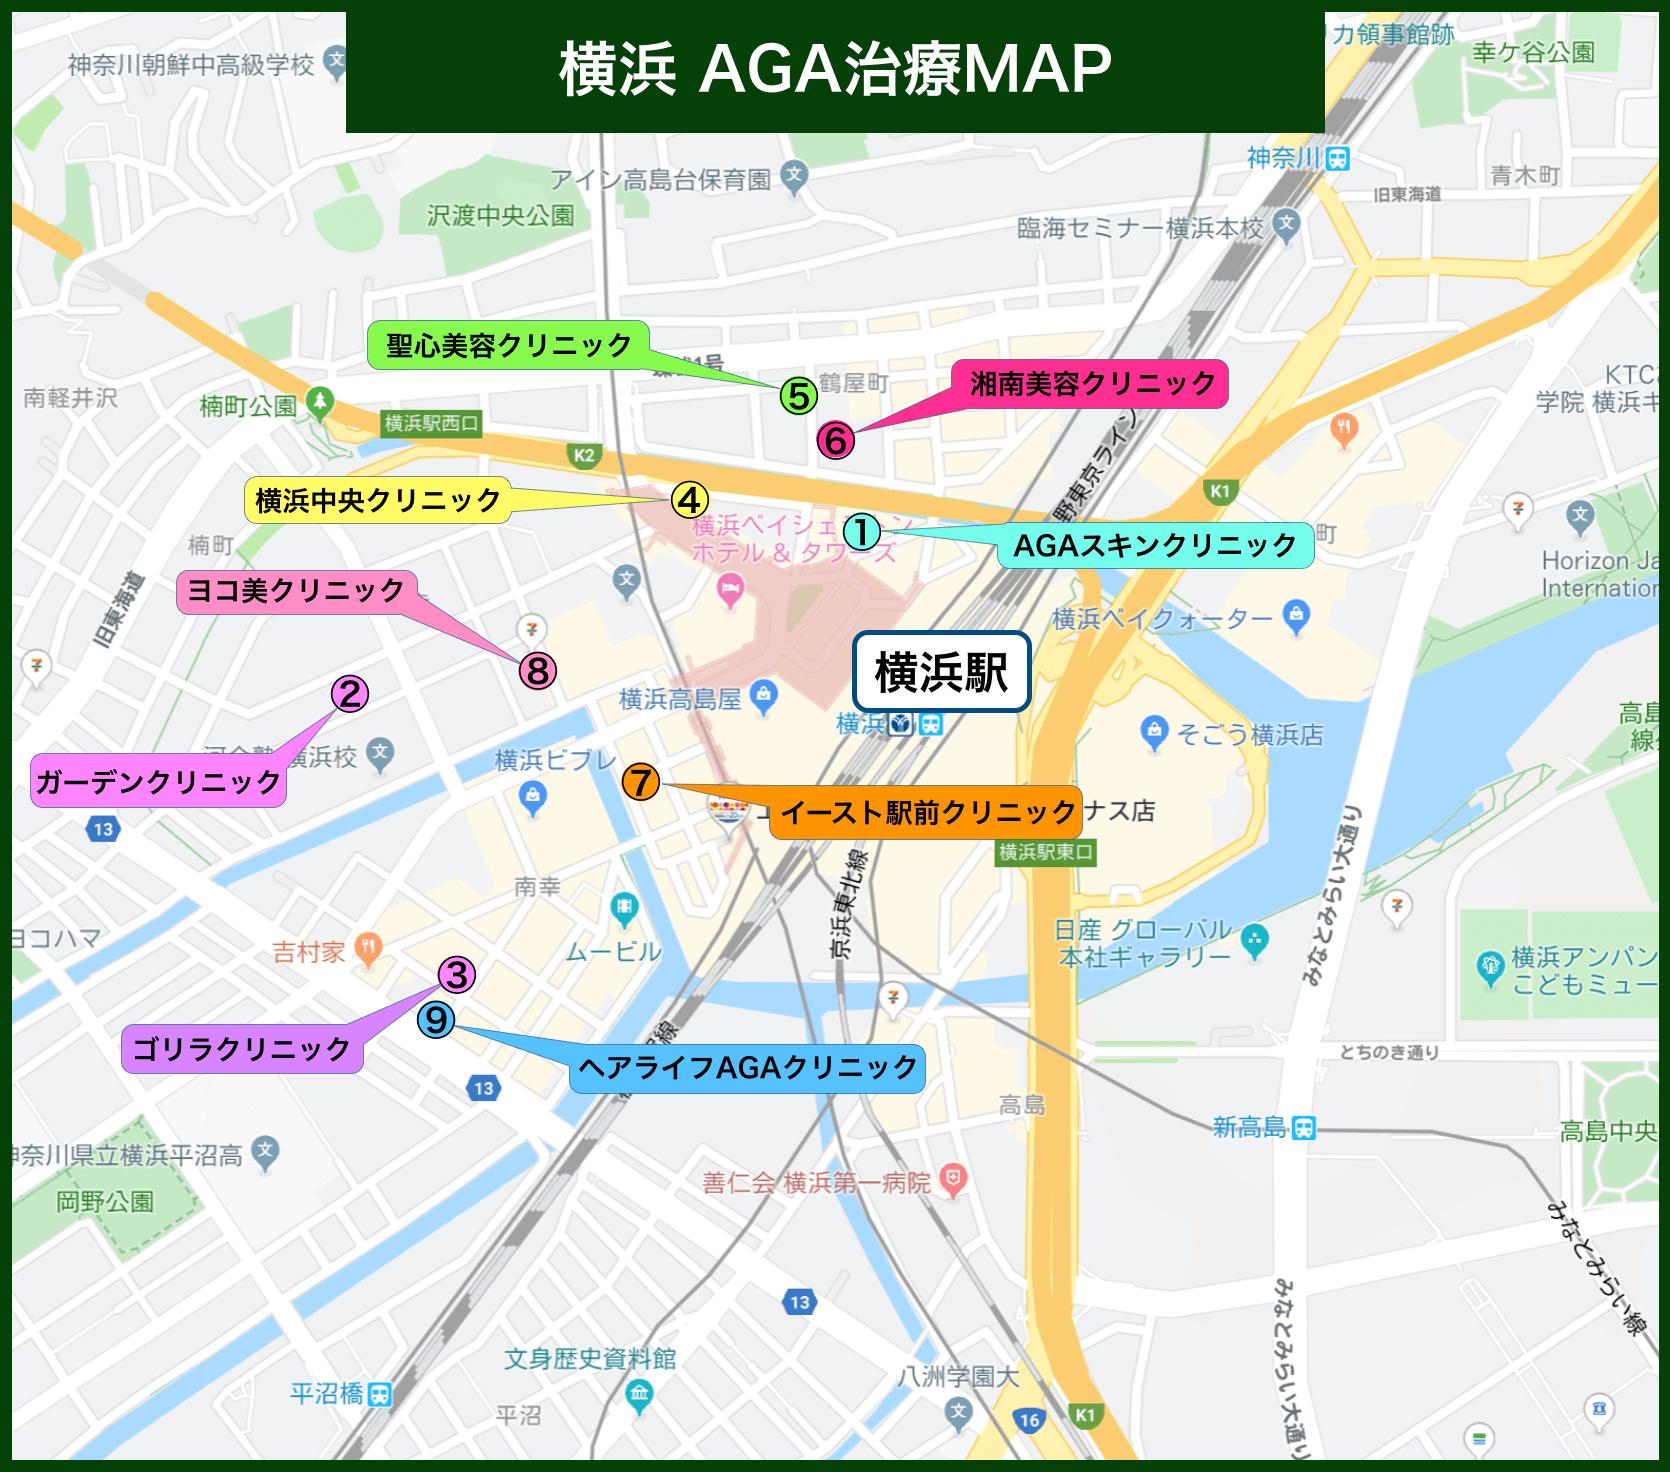 横浜AGA治療MAP(2020年版)